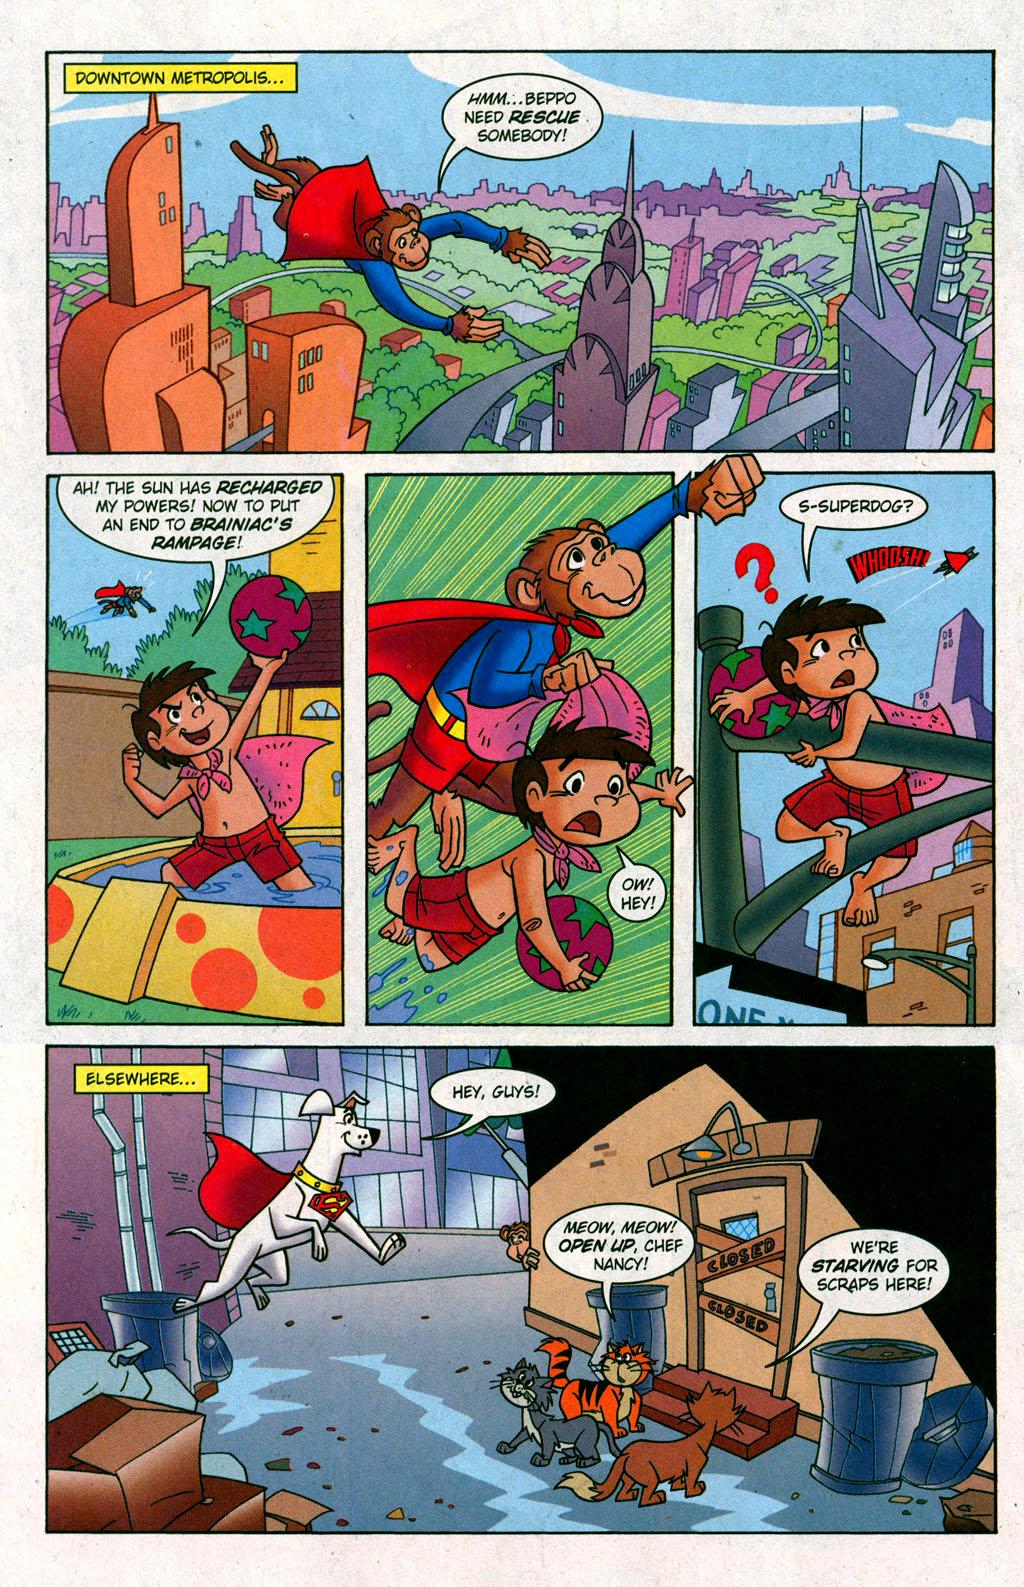 Read online Krypto the Superdog comic -  Issue #6 - 16